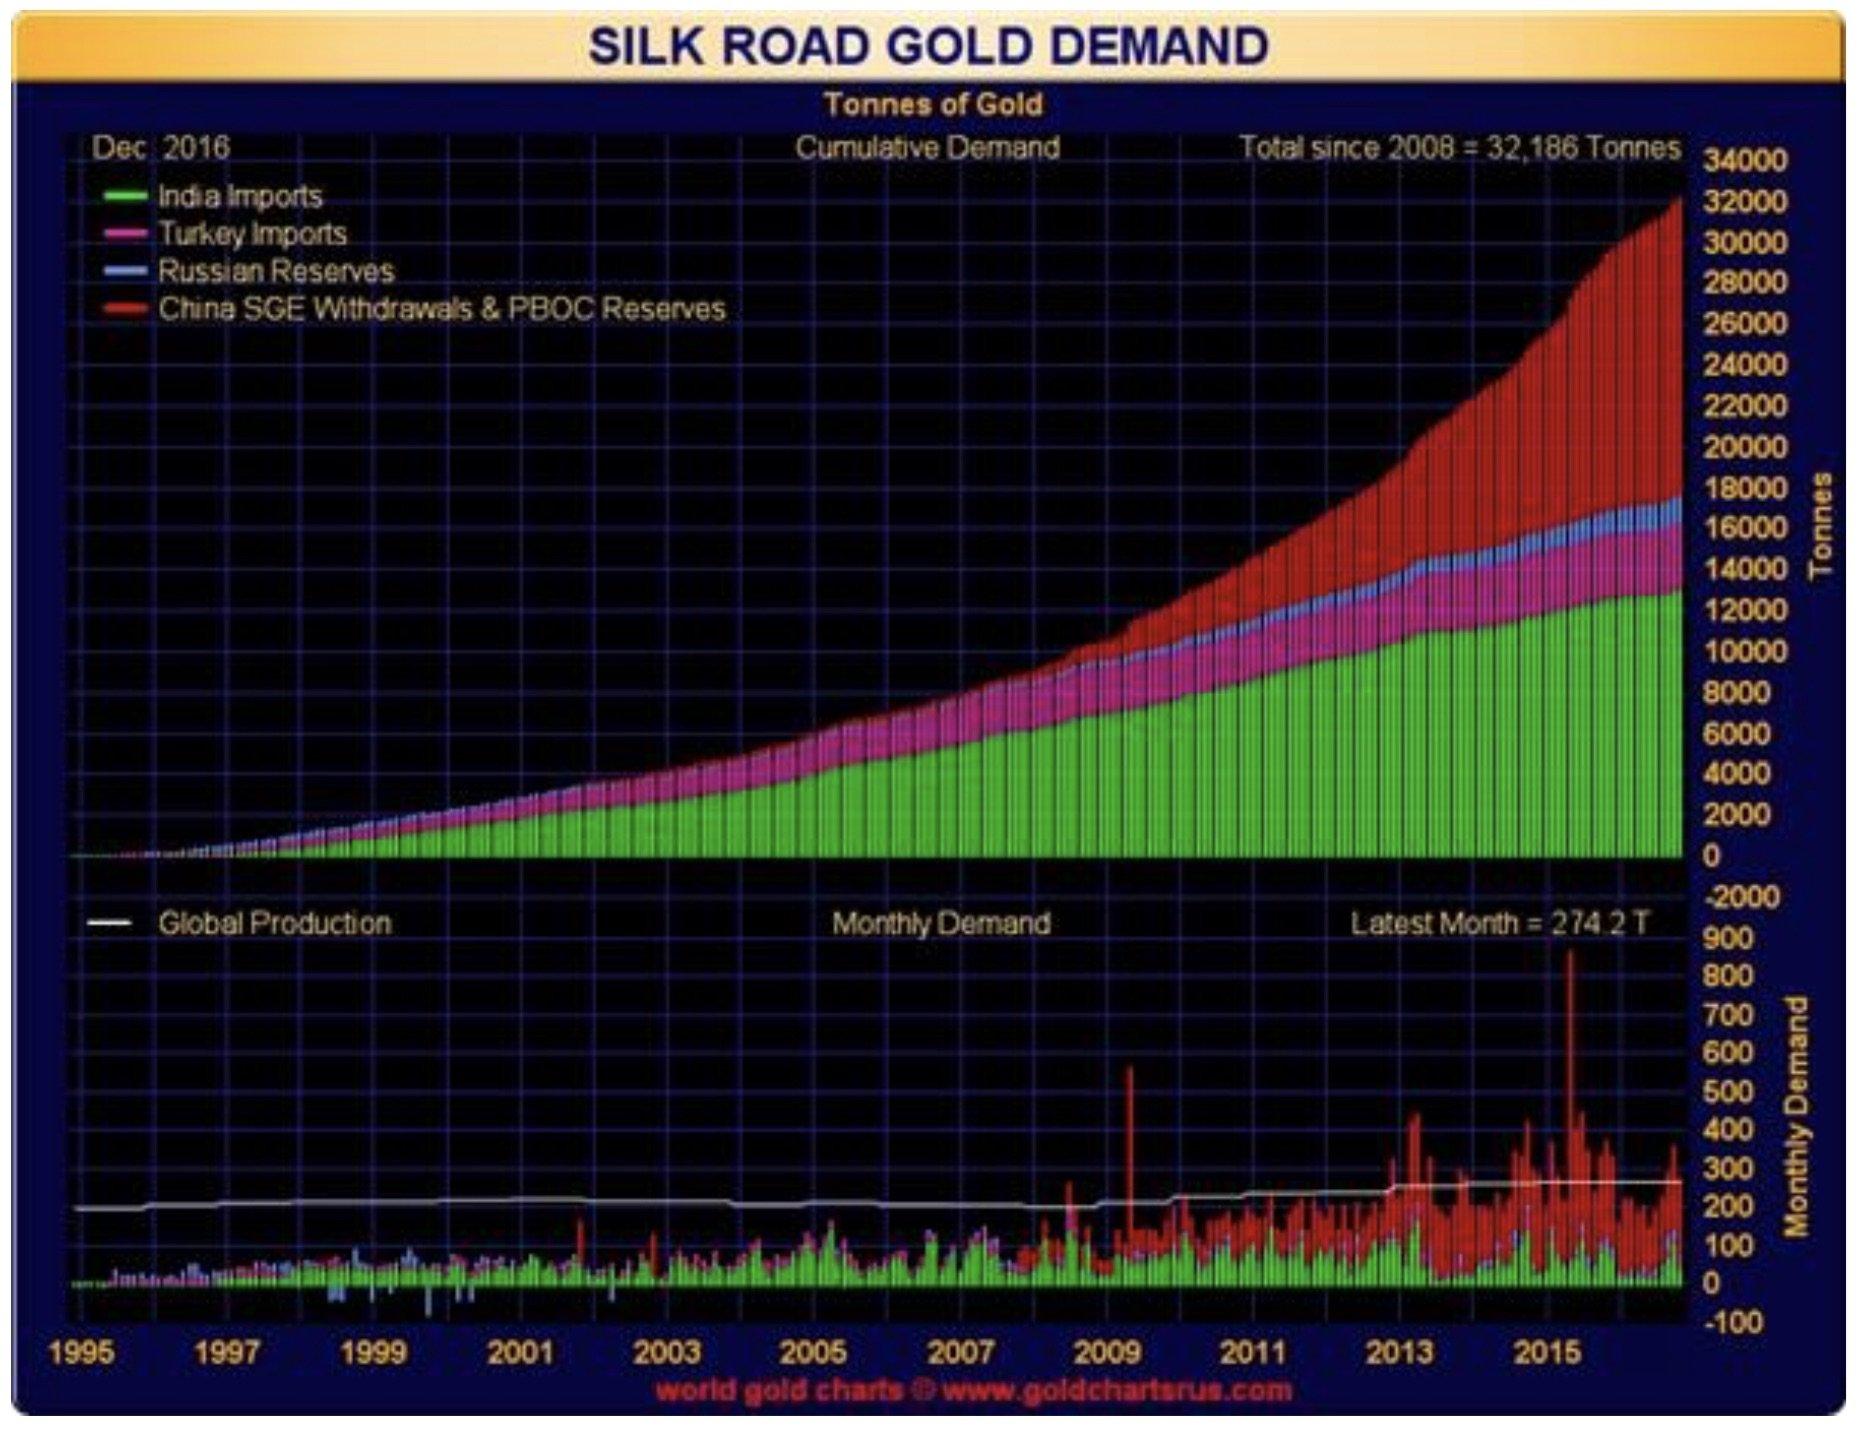 SILK ROAD GOLD DEMAND